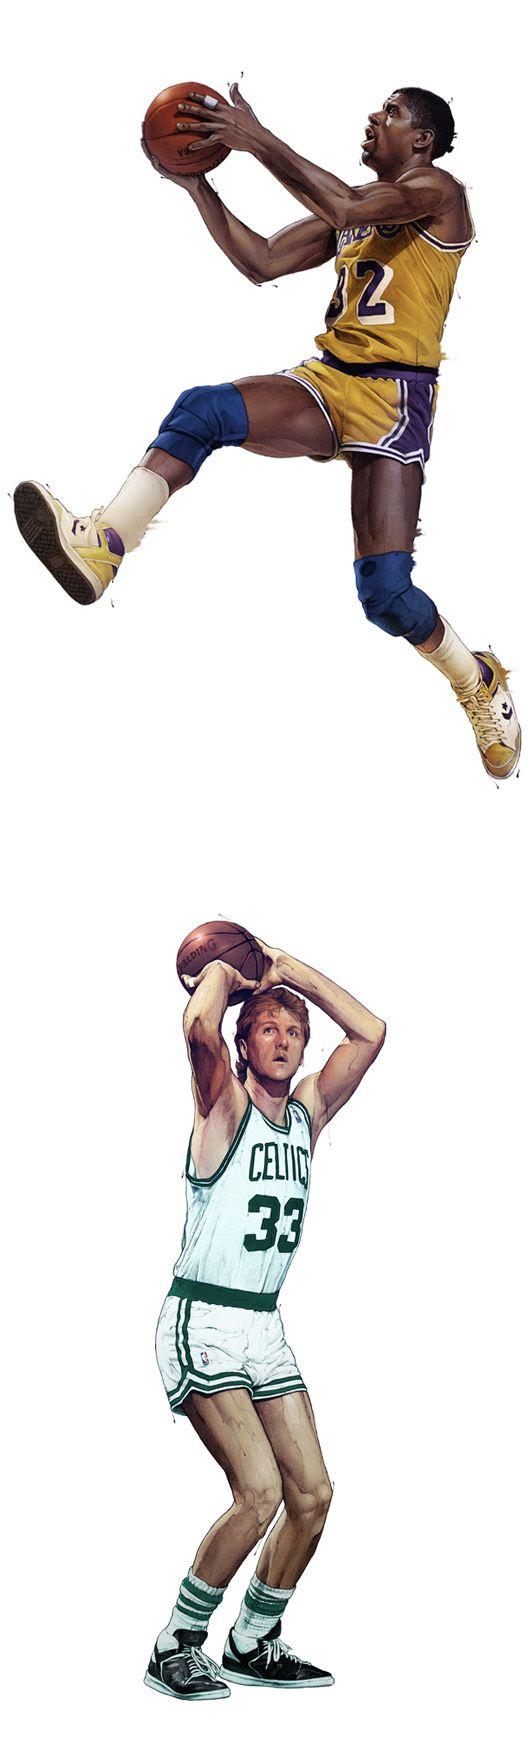 NBA Illustrations by Grzegorz Domaradzki | Inspiration Grid | Design Inspiration